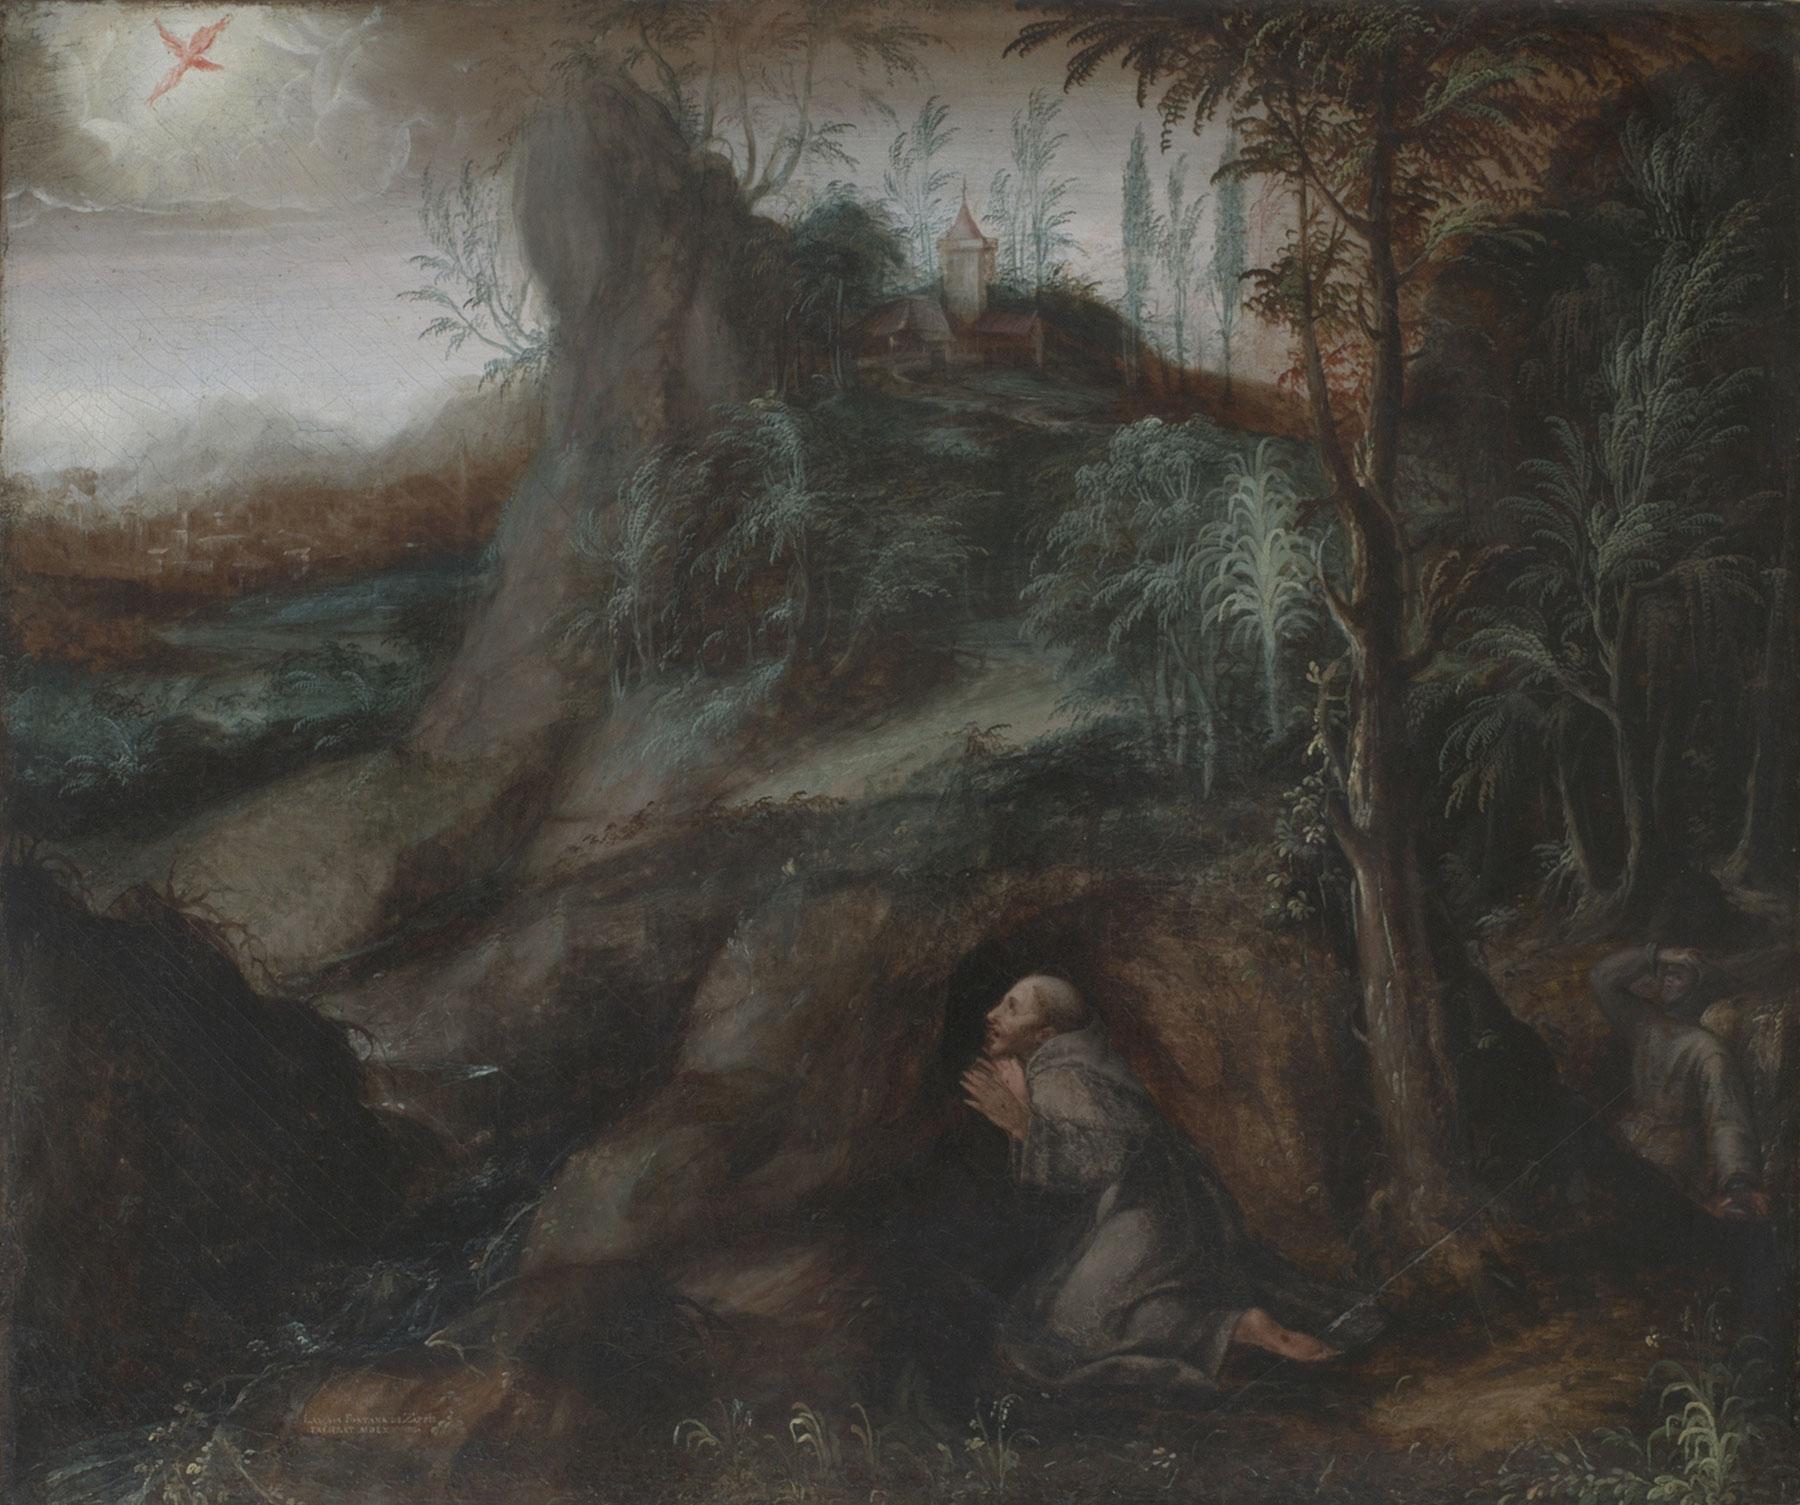 Lavinia Fontana, San Francesco riceve le stimmate (1579; olio su tela, 63 x 75 cm; Bologna, Seminario Arcivescovile, F7Z0068 - F7Z0069)